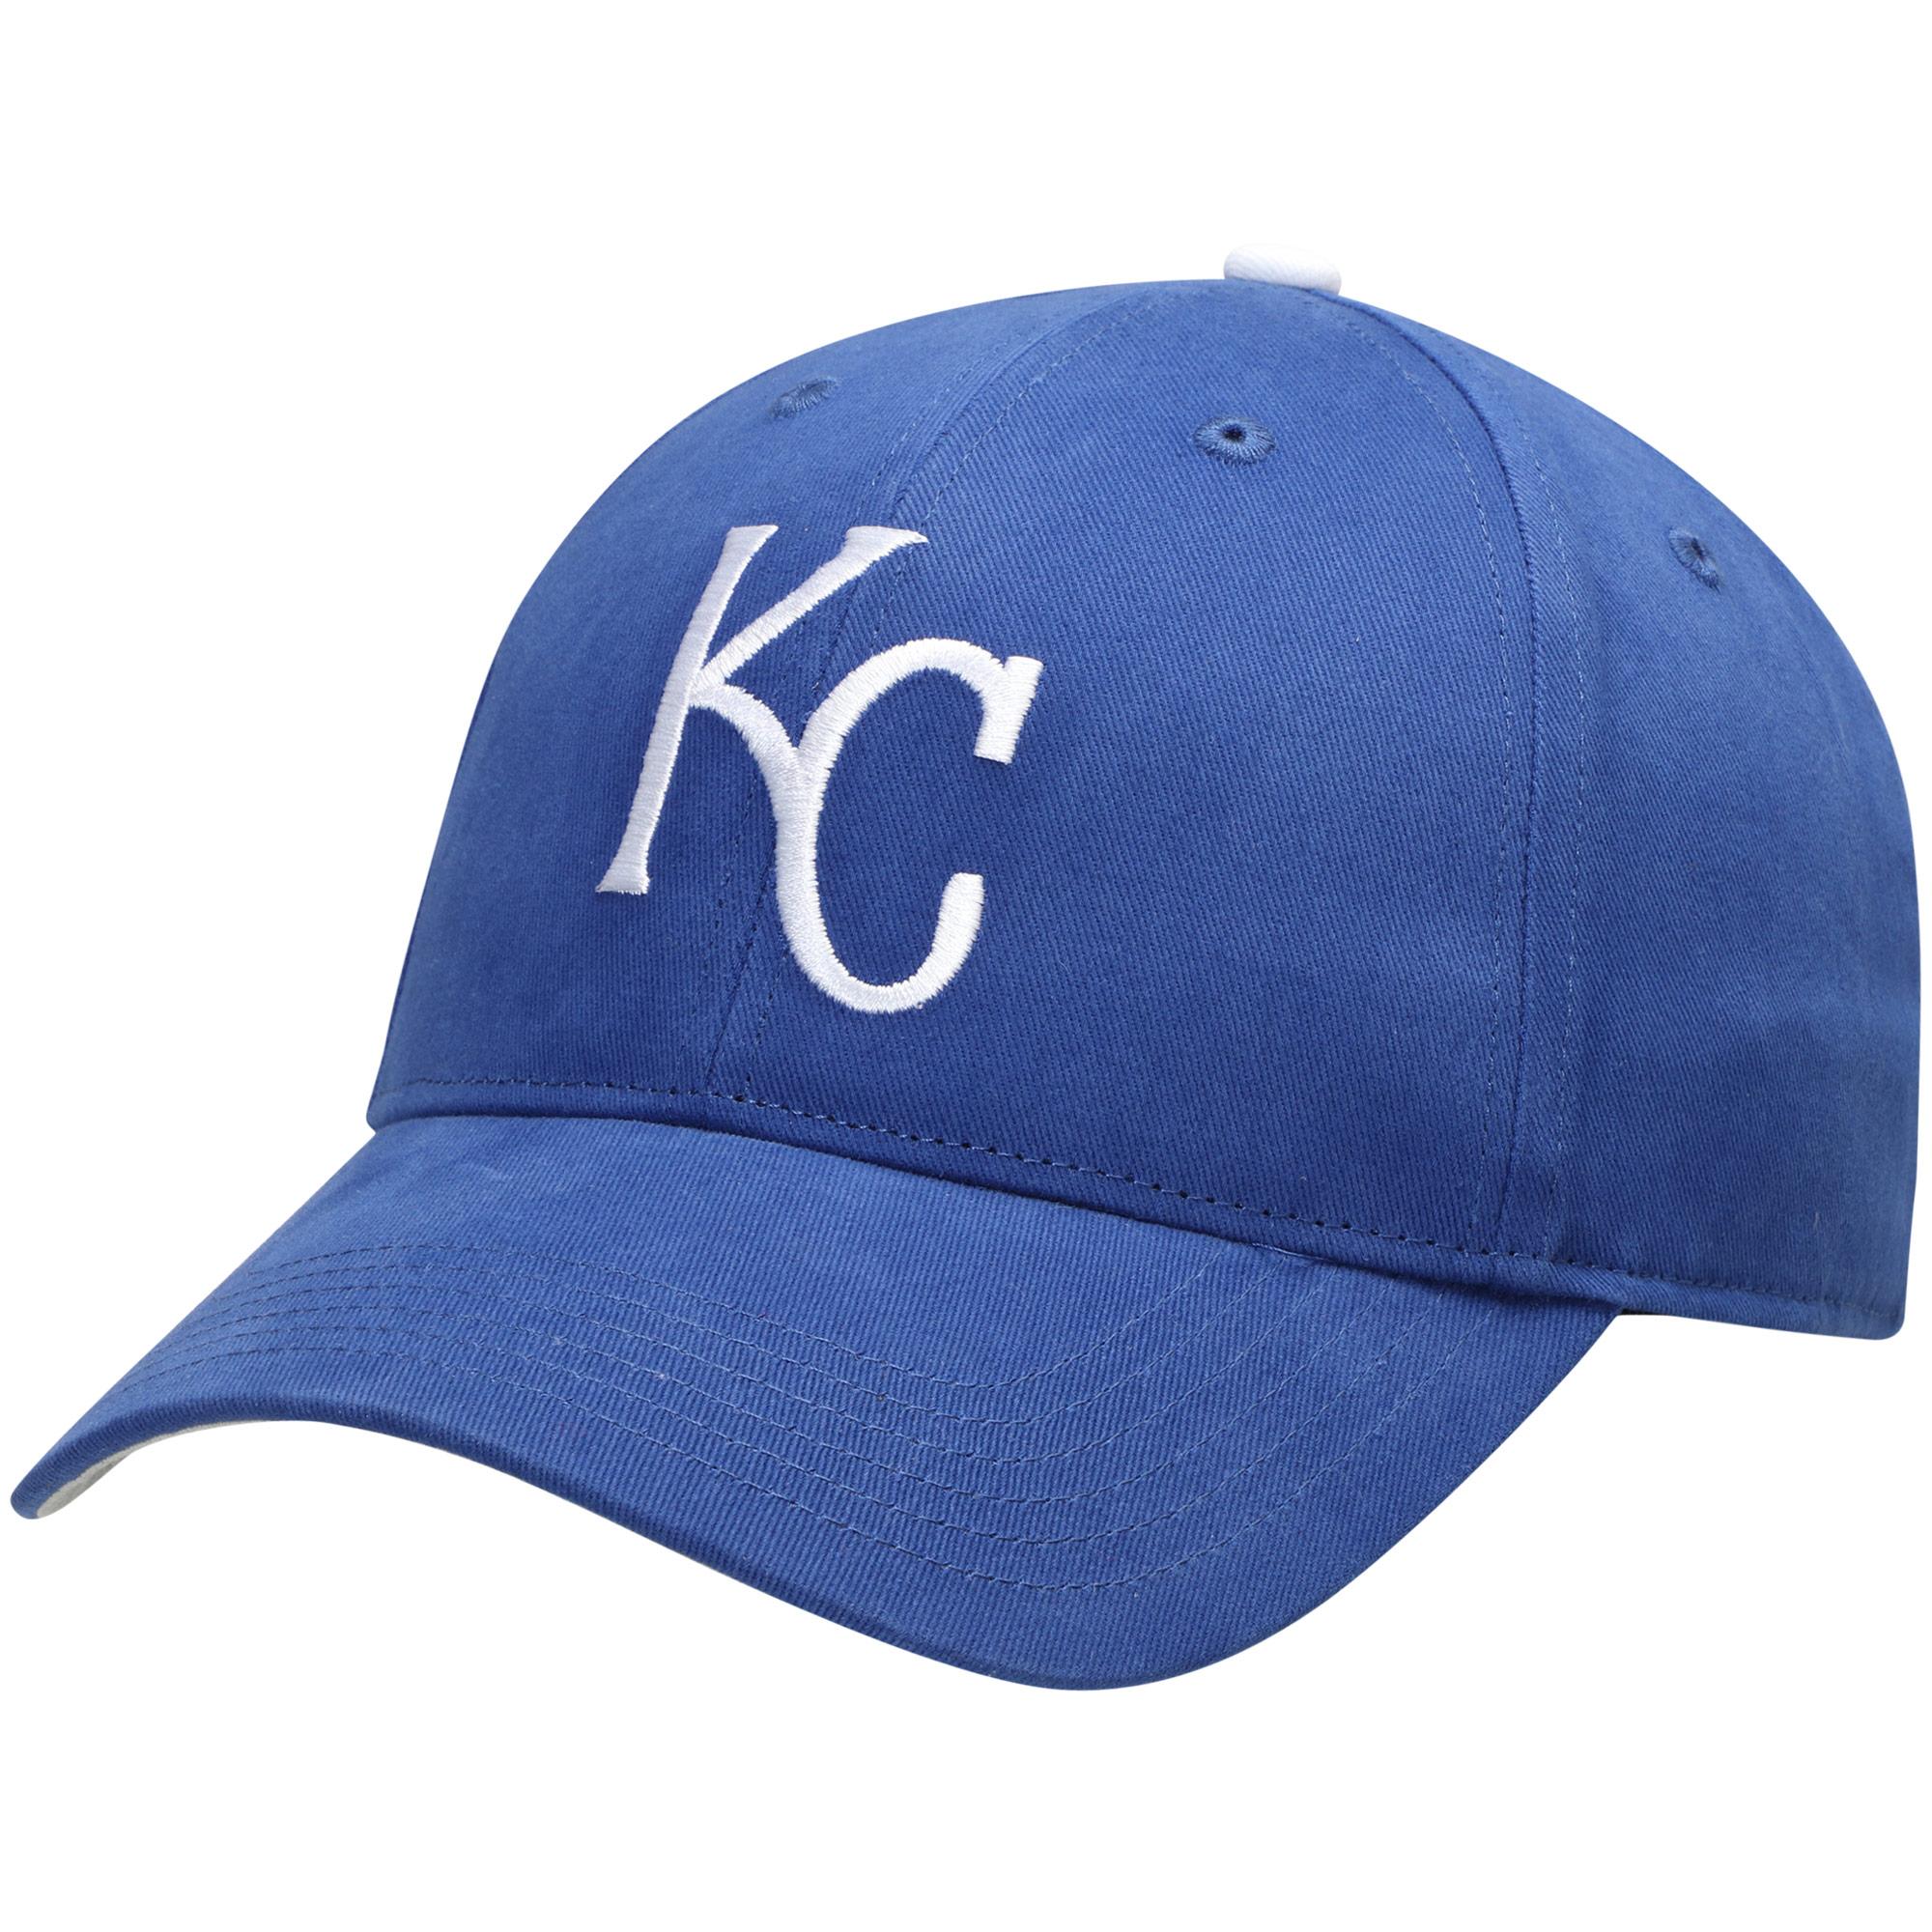 Kansas City Royals Fan Favorite Basic Adjustable Hat - Royal - OSFA